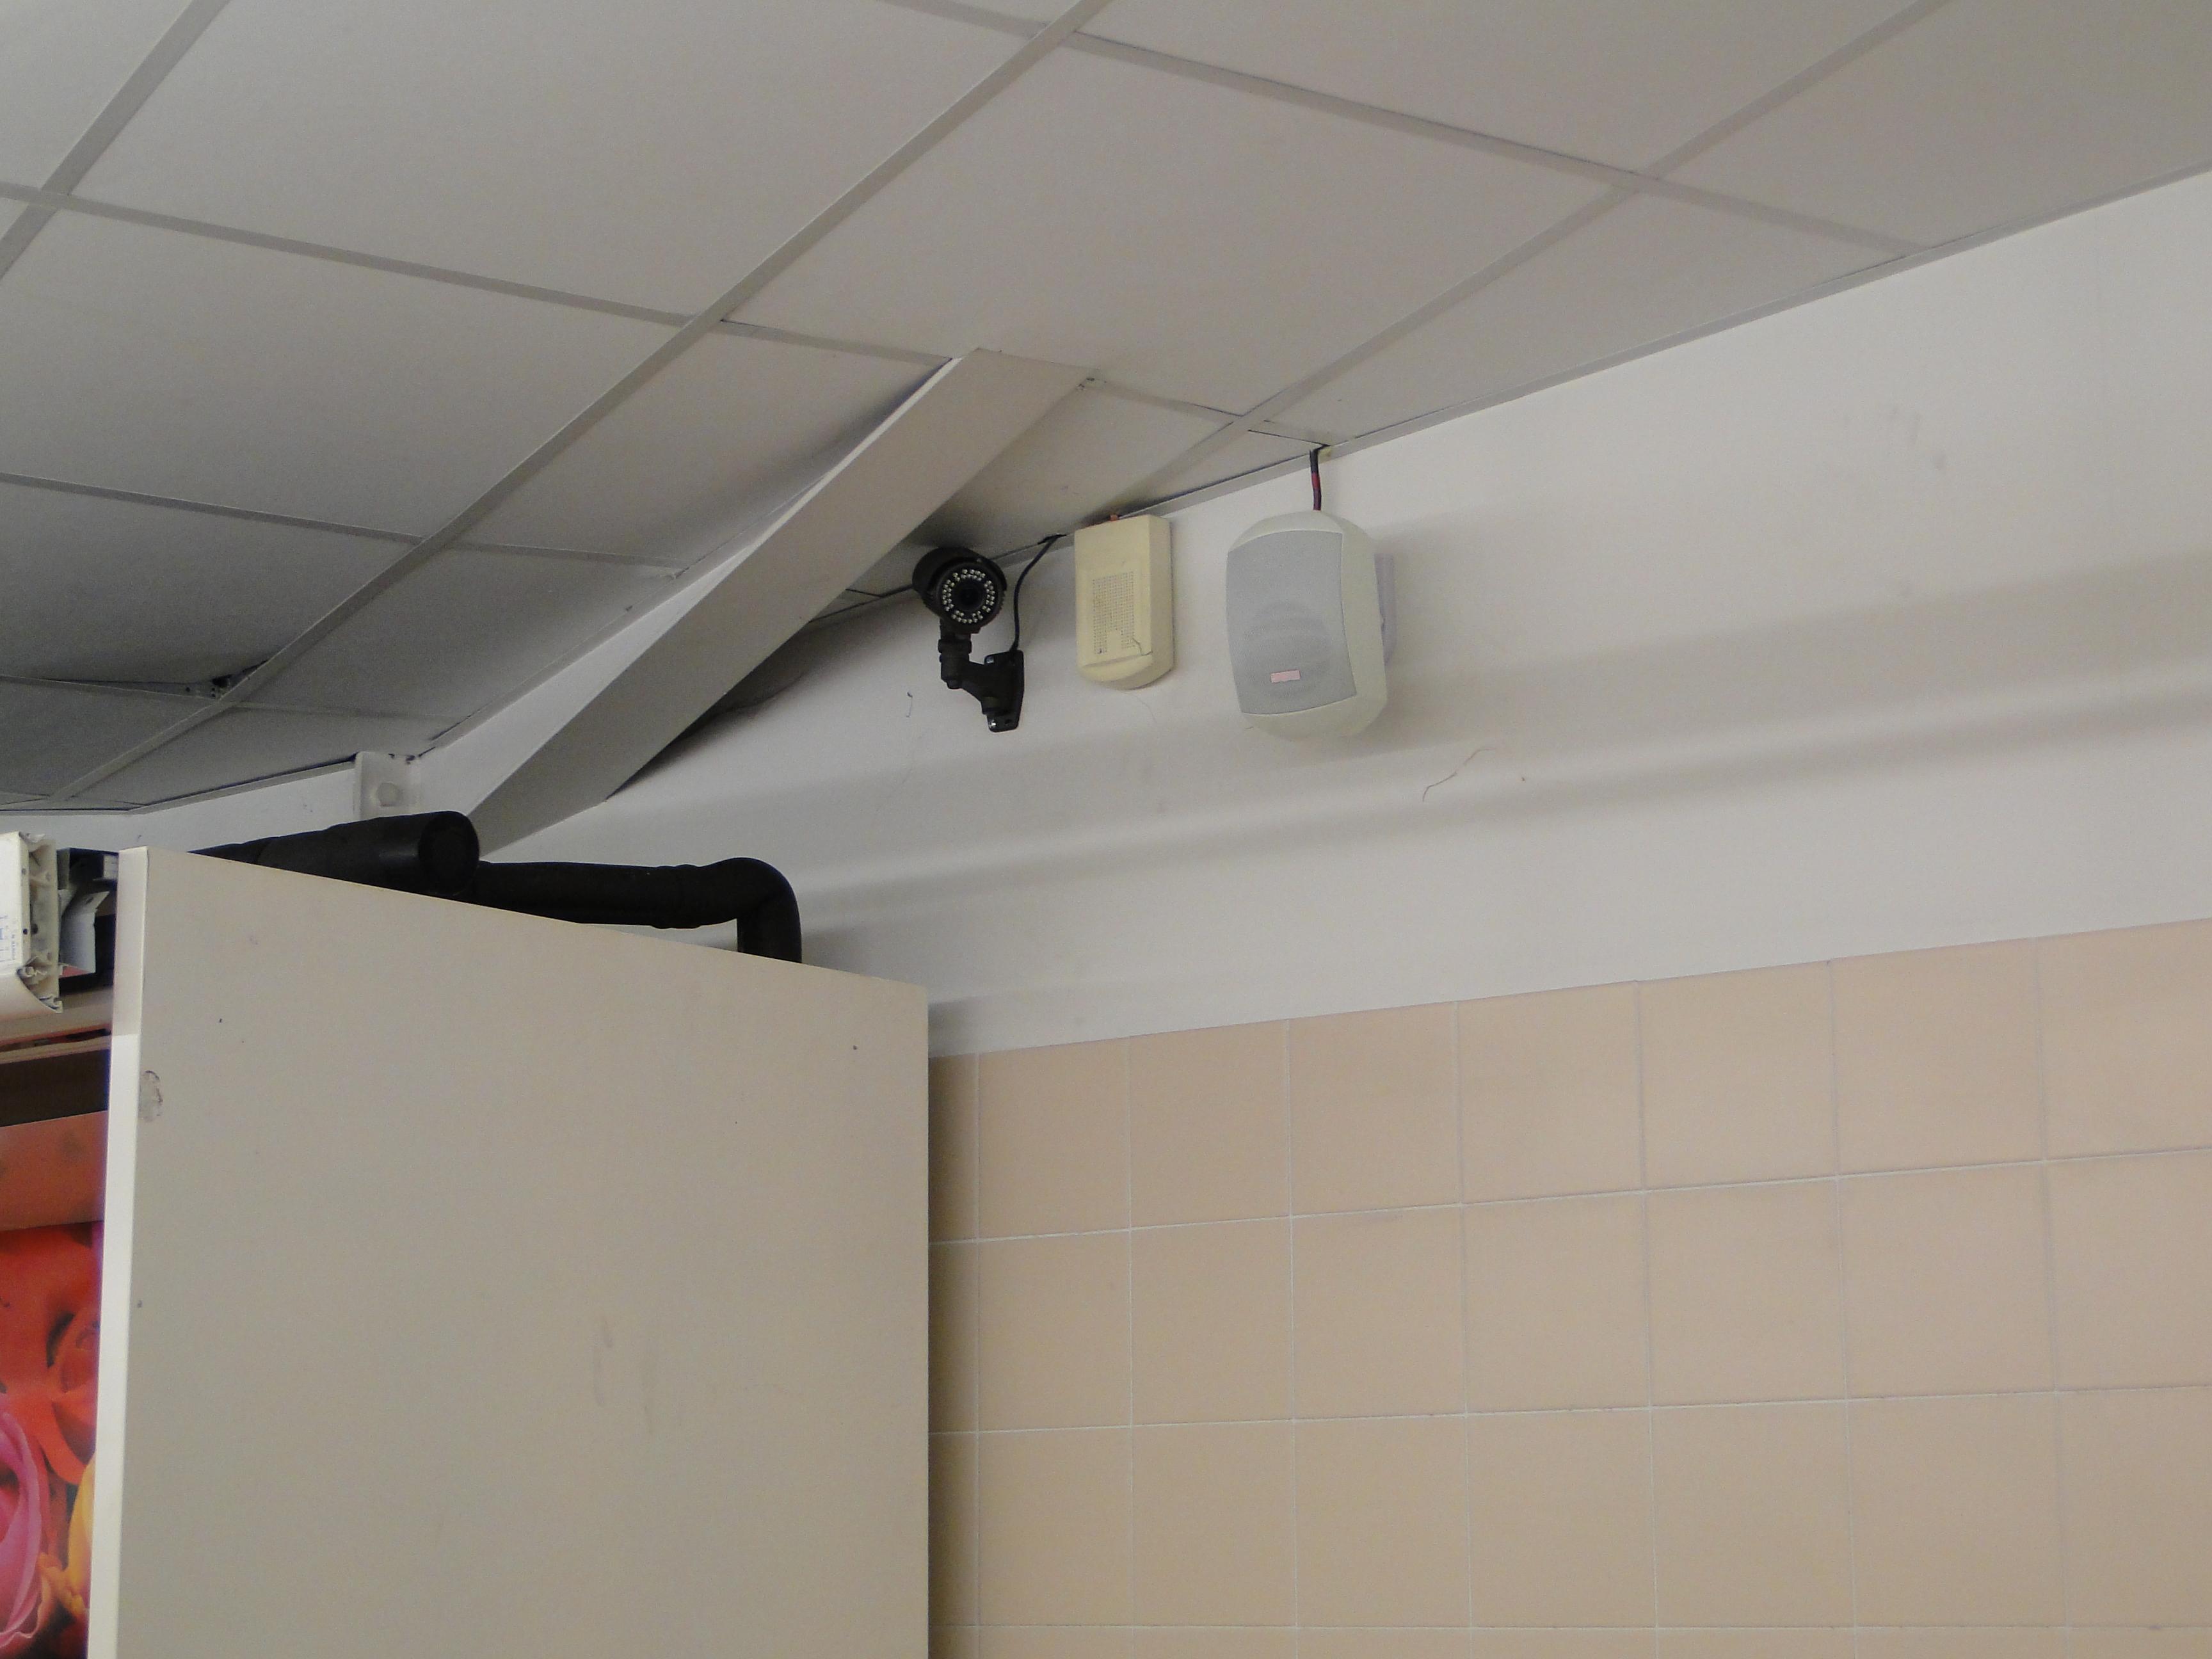 installation de syst mes de surveillance. Black Bedroom Furniture Sets. Home Design Ideas